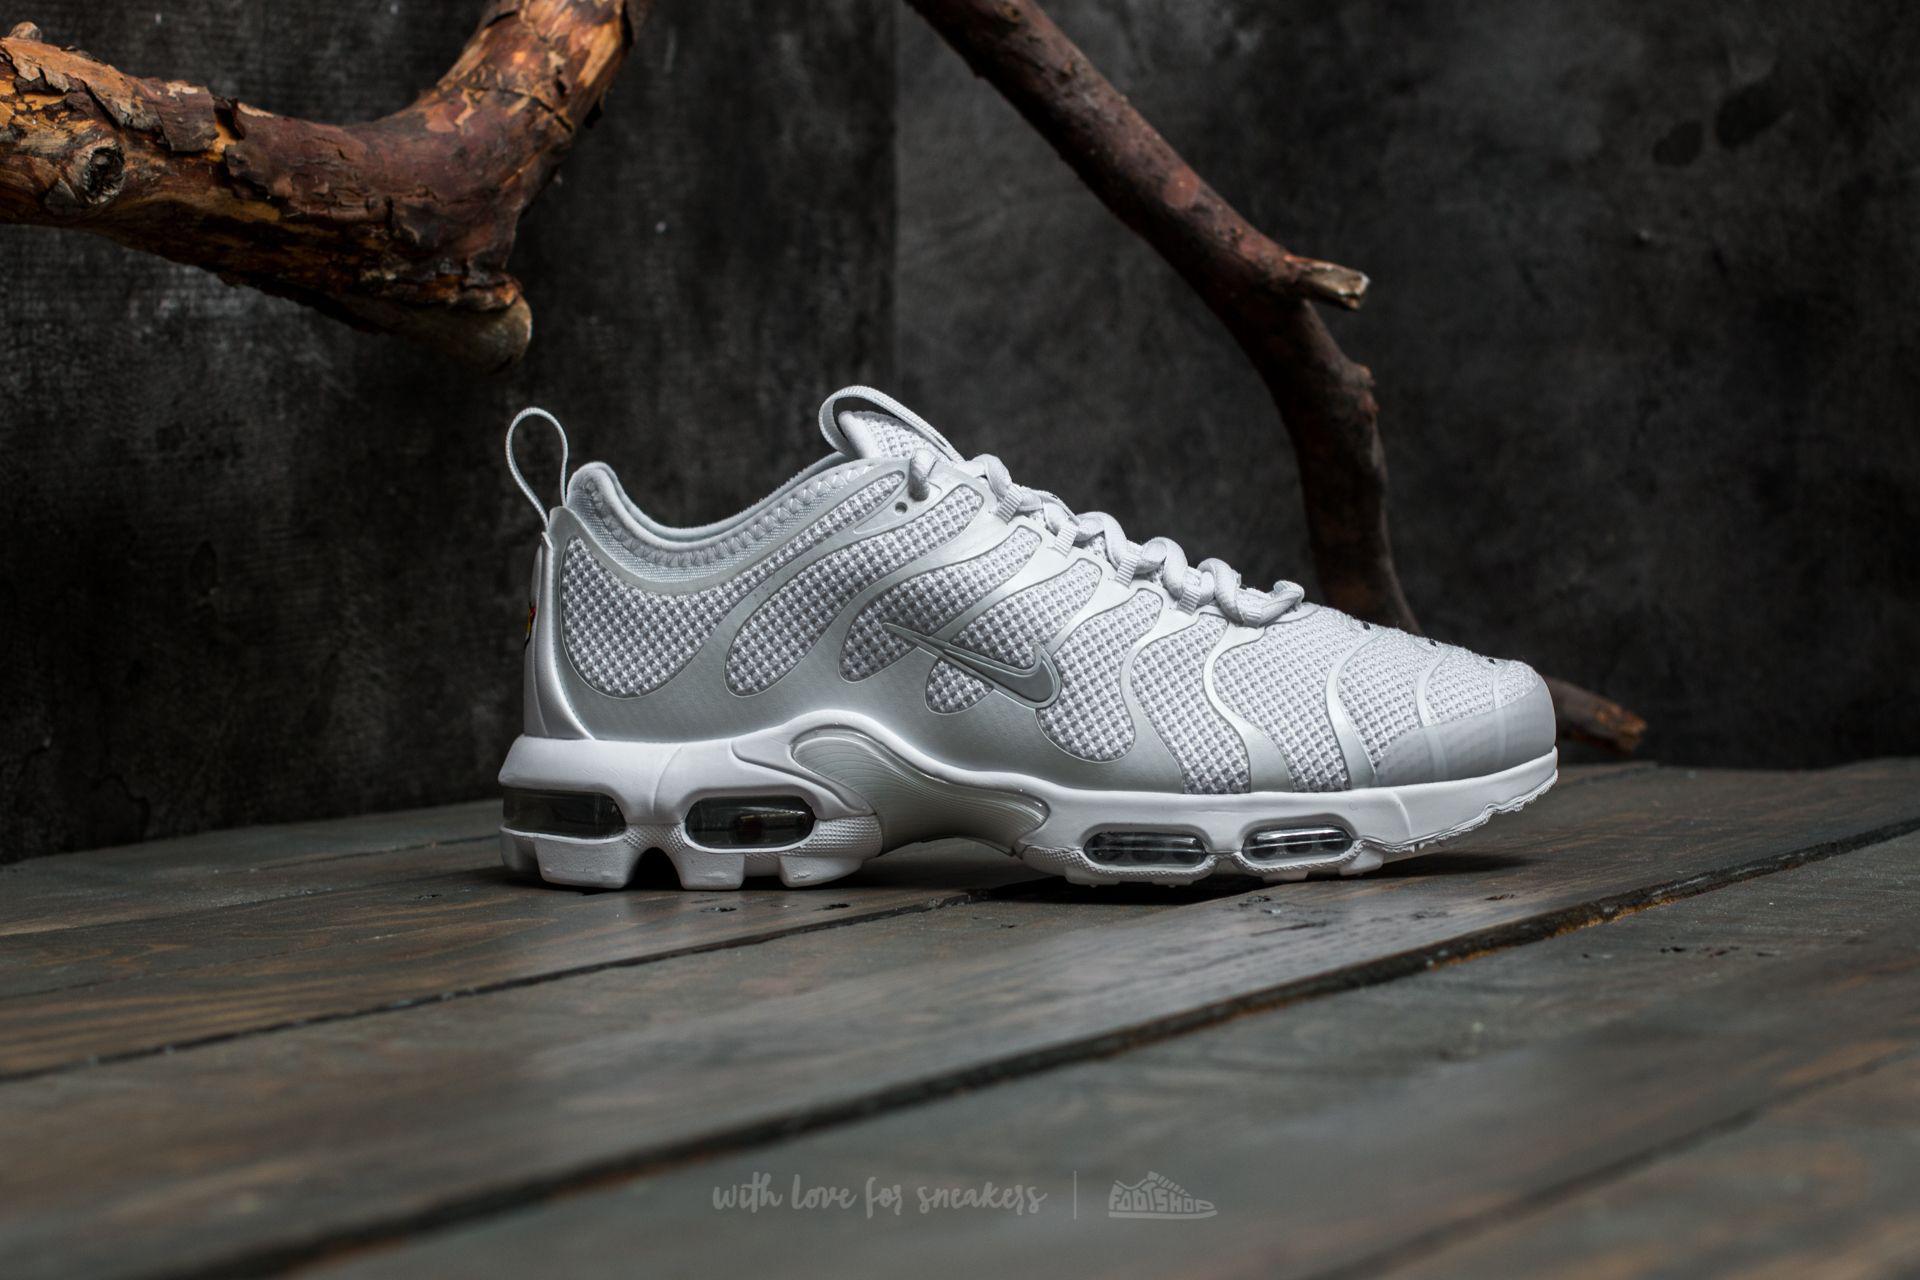 1a8c42ea39 Nike Air Max Plus Tn Ultra White/ Pure Platinum-white in White for ...